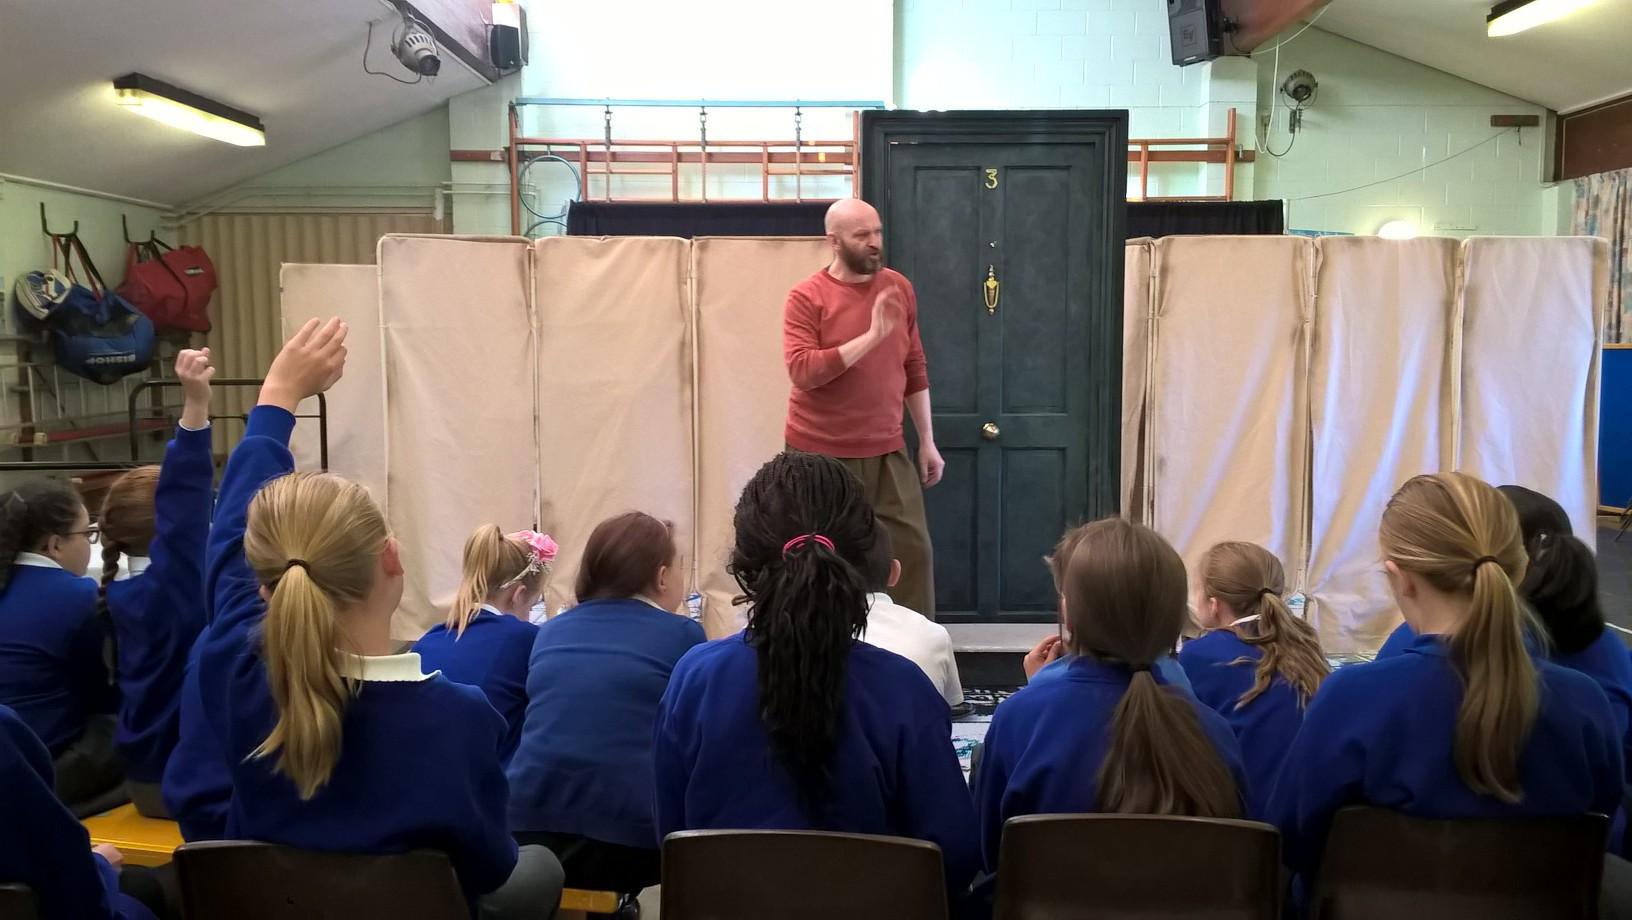 Over The Top - Fairway Primary